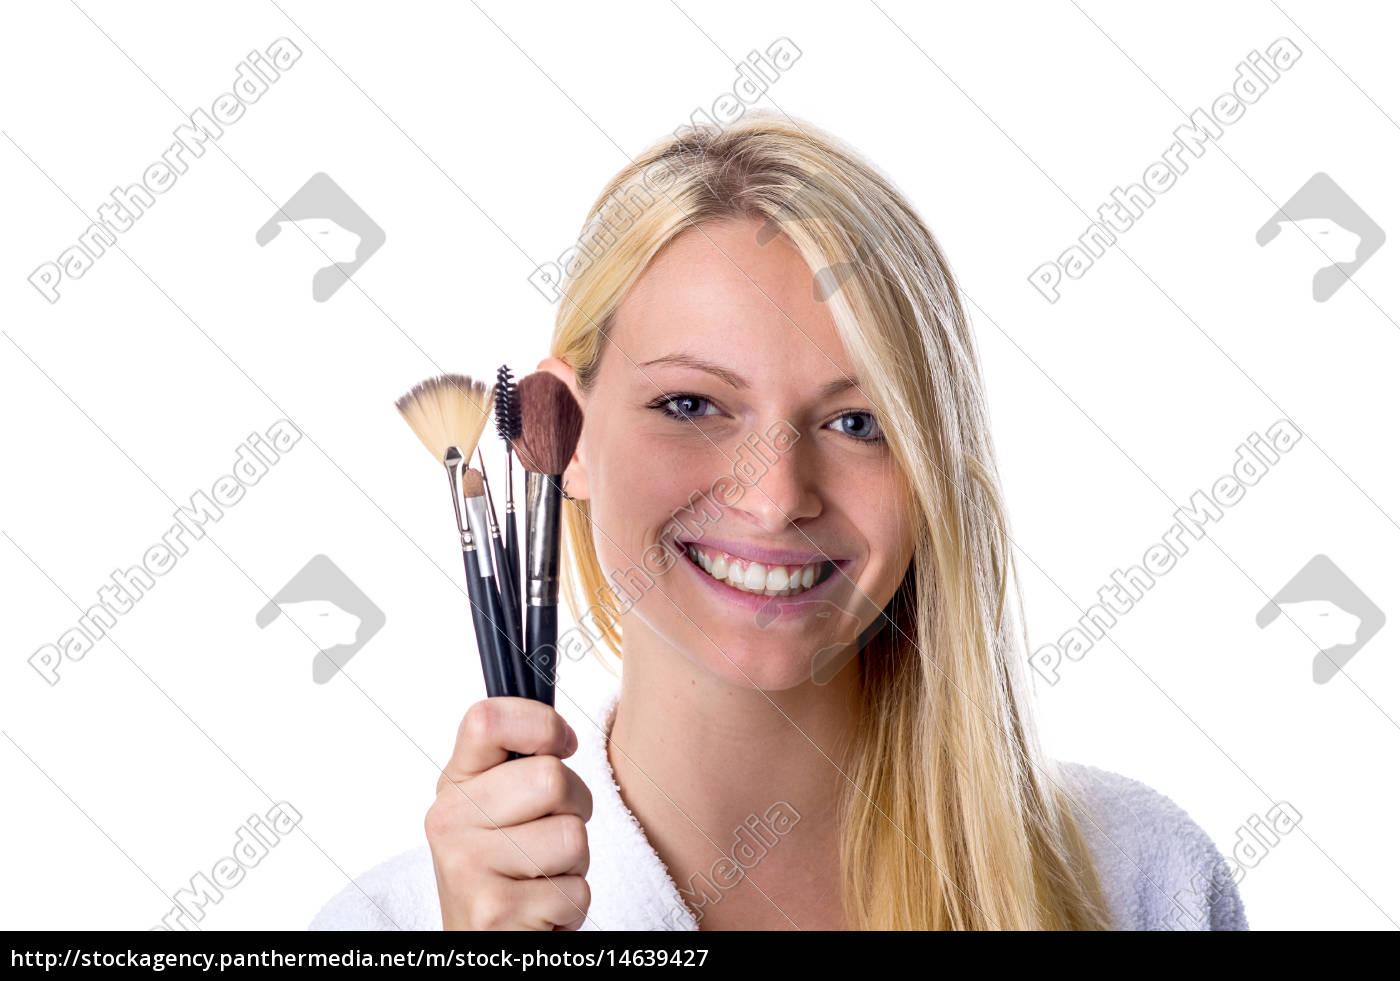 junge, frau, mit, make, up, pinsel - 14639427